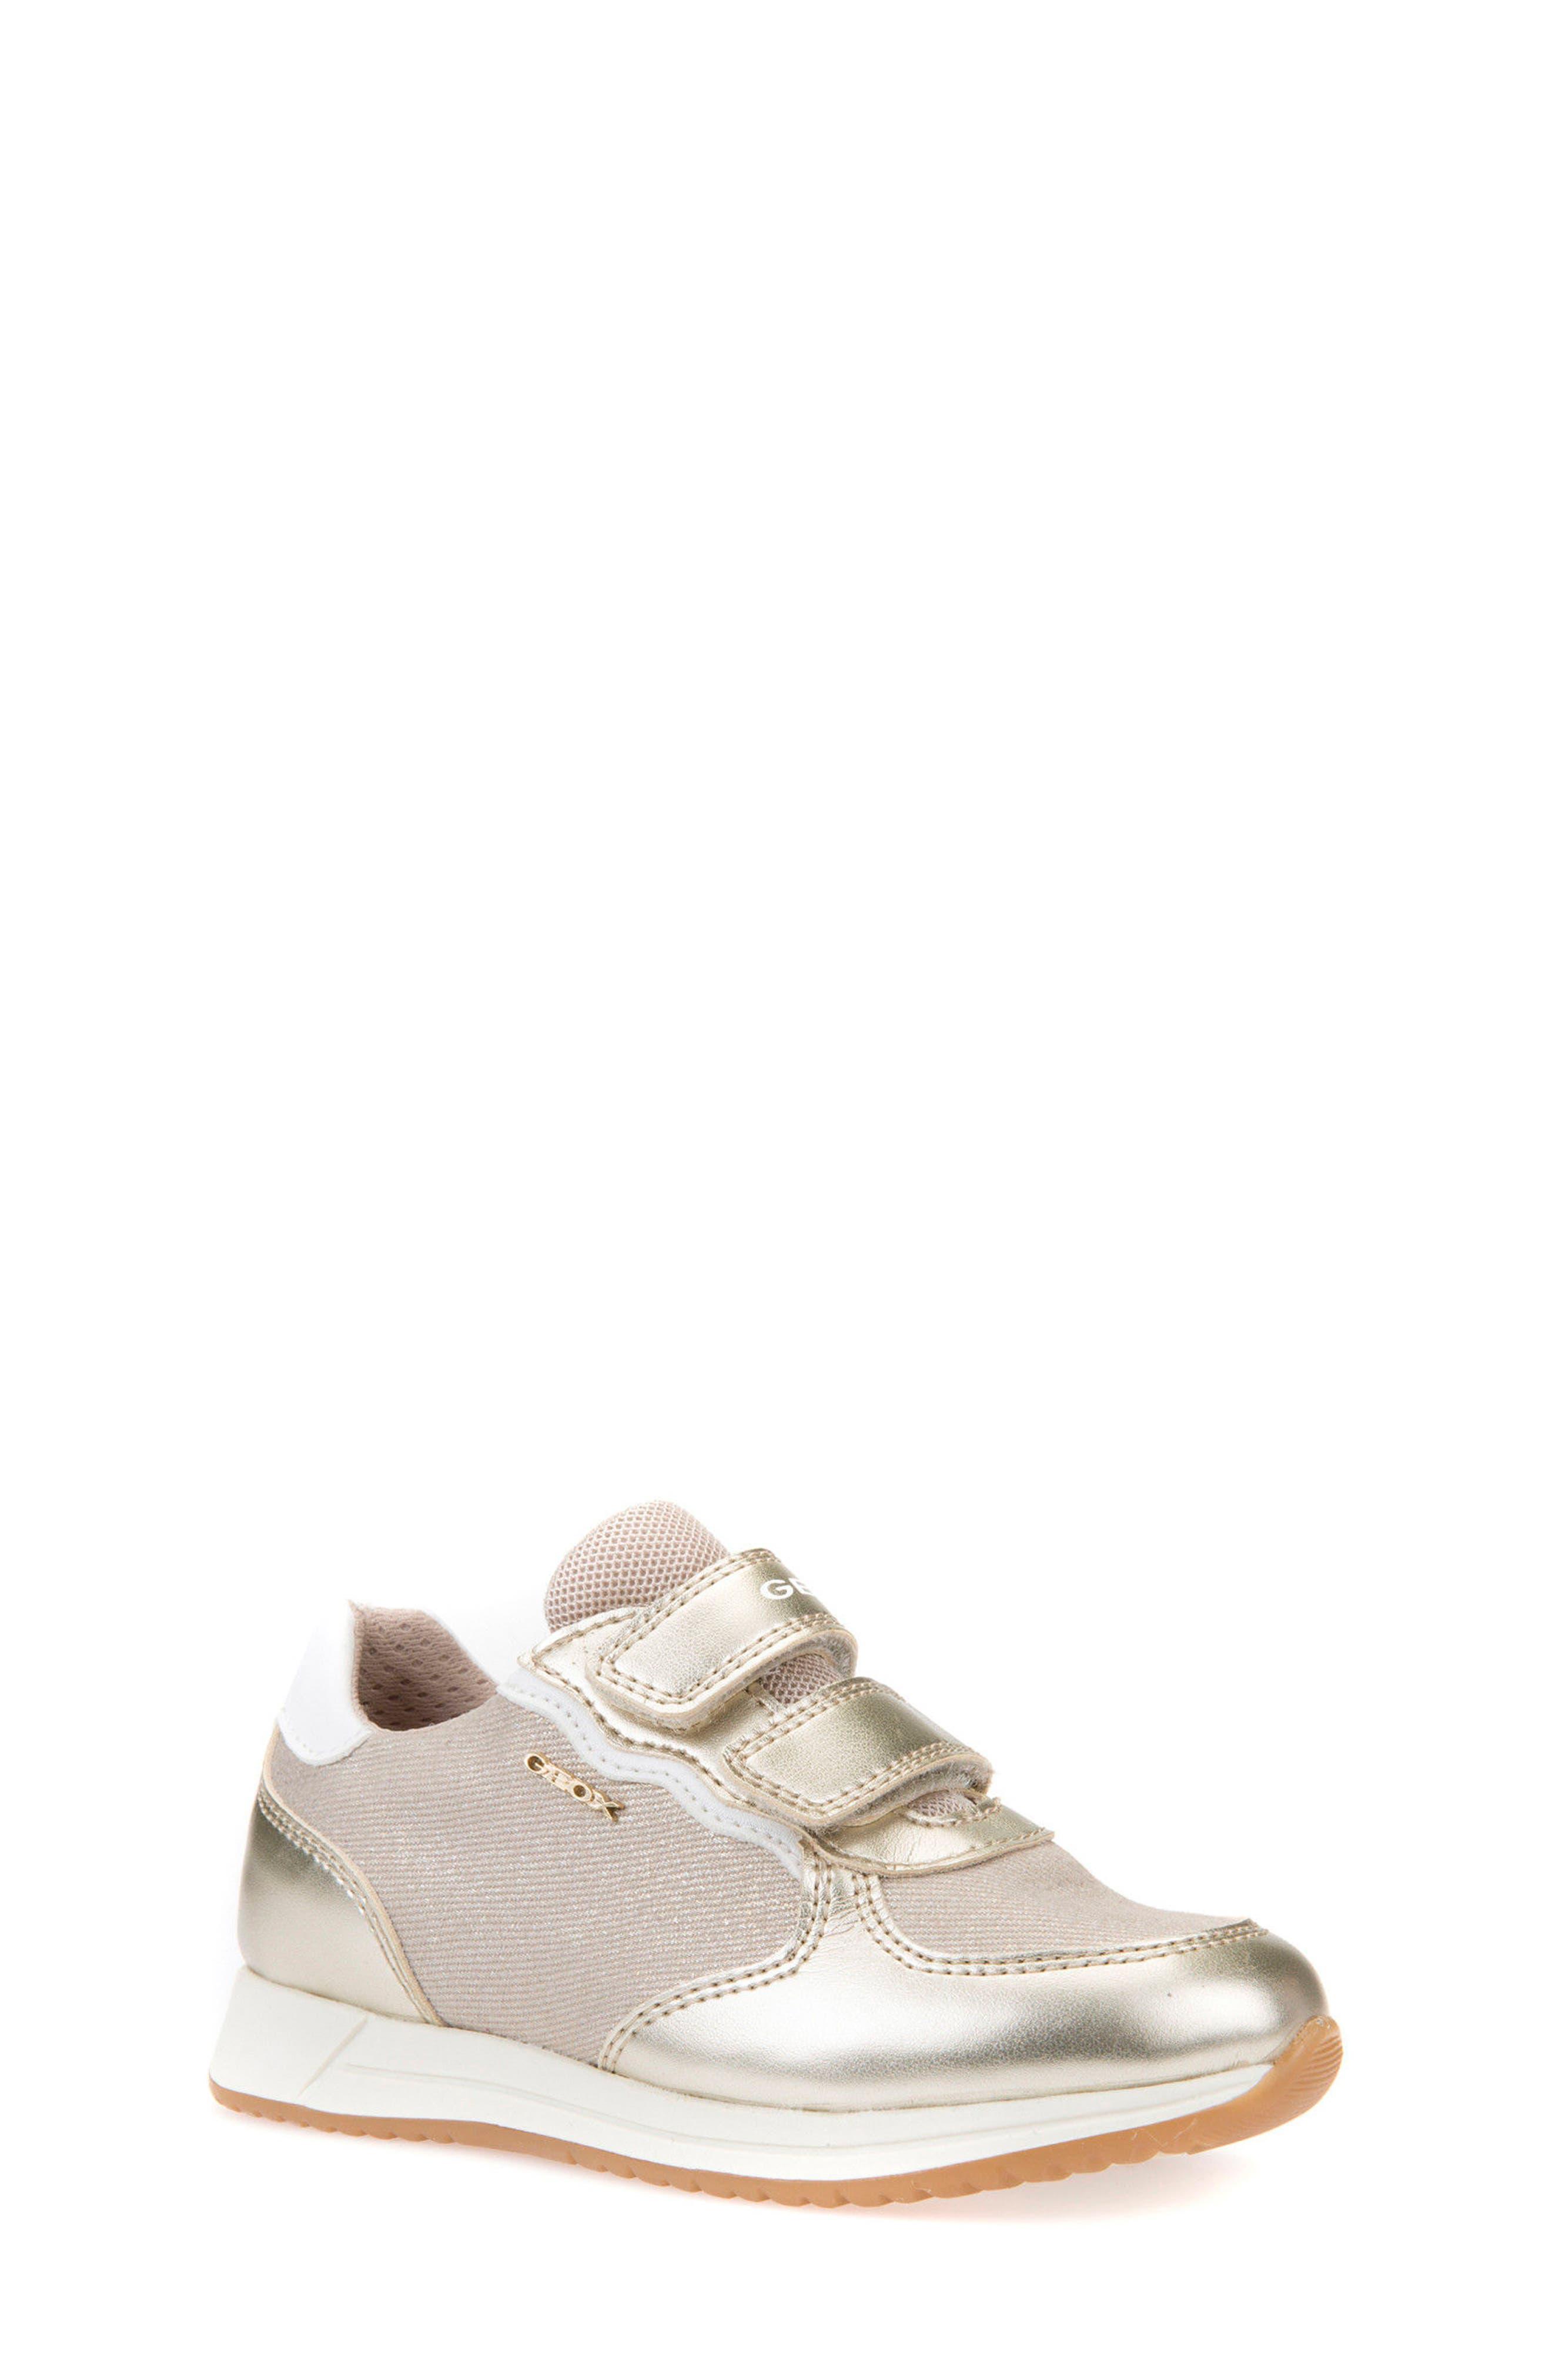 Jensea Metallic Accent Sneaker,                         Main,                         color, BEIGE/ LIGHT GOLD